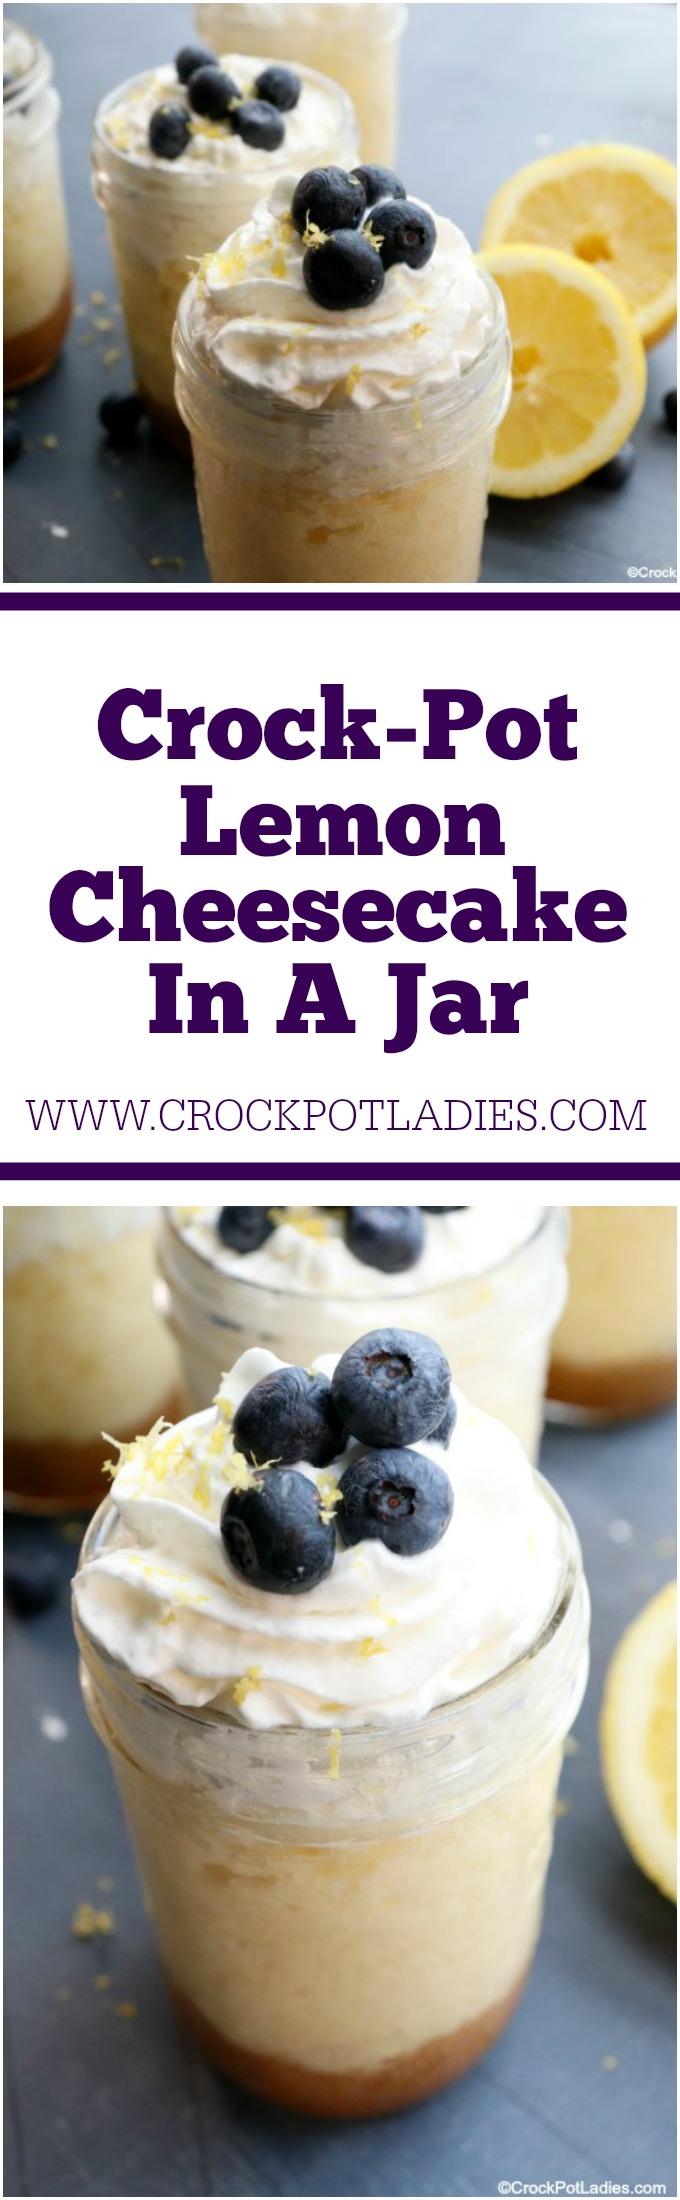 Crock-Pot Lemon Cheesecake In A Jar